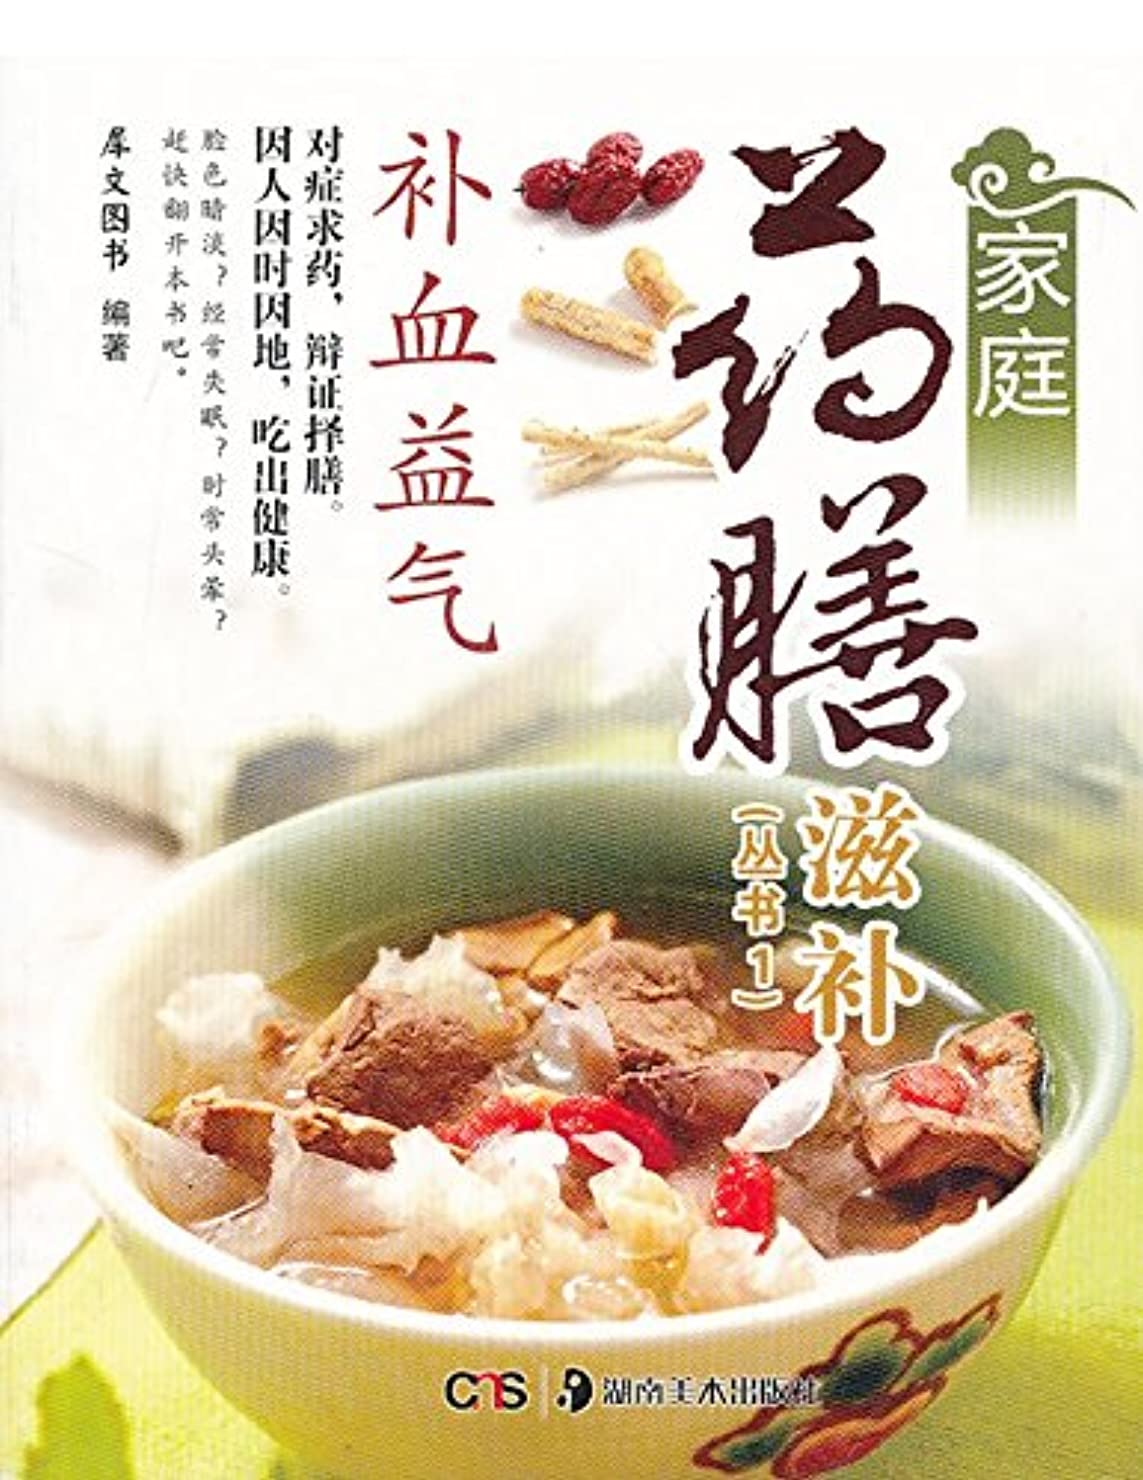 家庭药膳滋补:补血益气 (Chinese Edition)